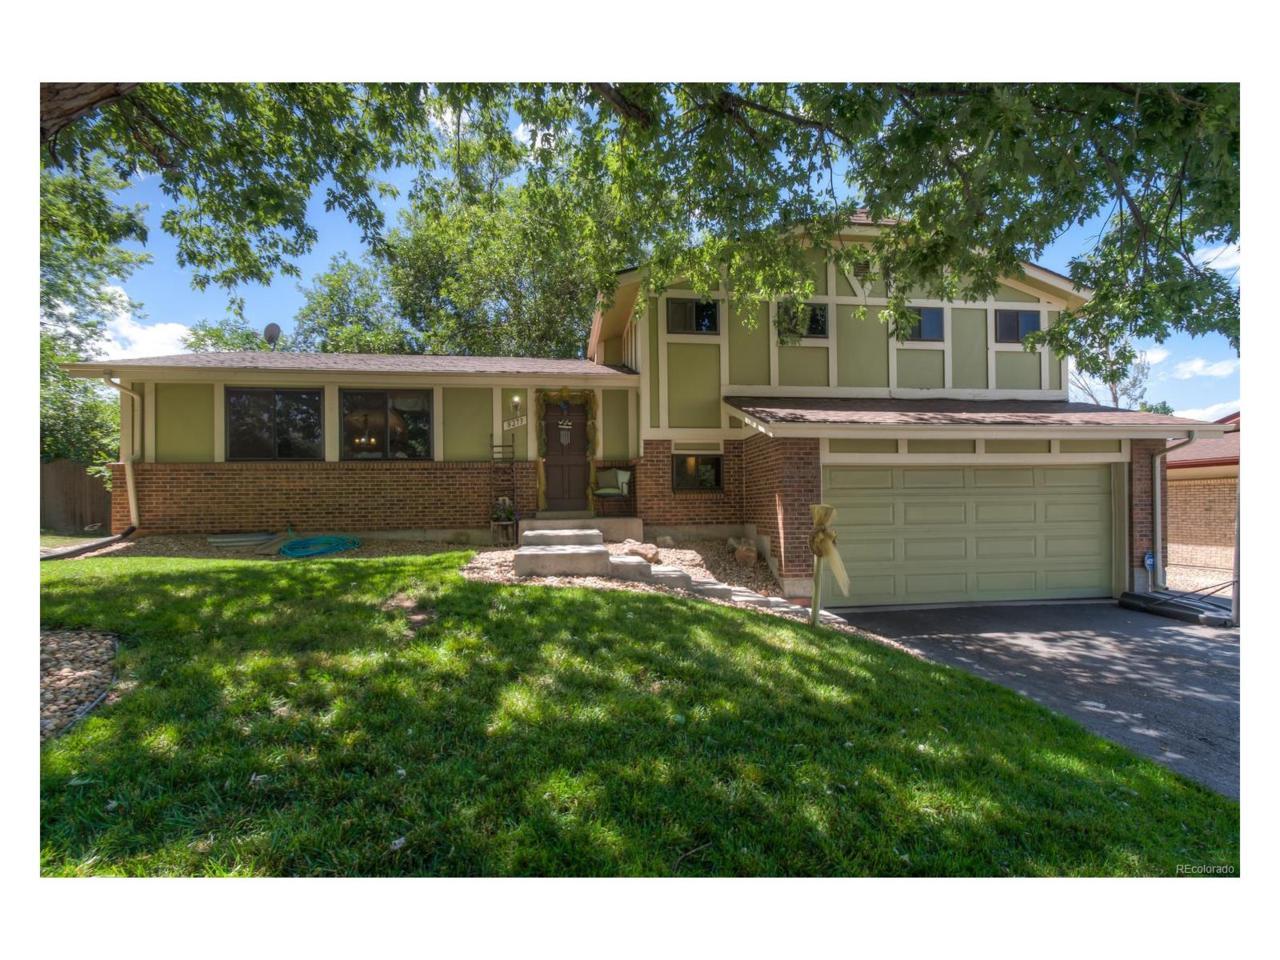 8273 Yukon Court, Arvada, CO 80005 (MLS #6108372) :: 8z Real Estate